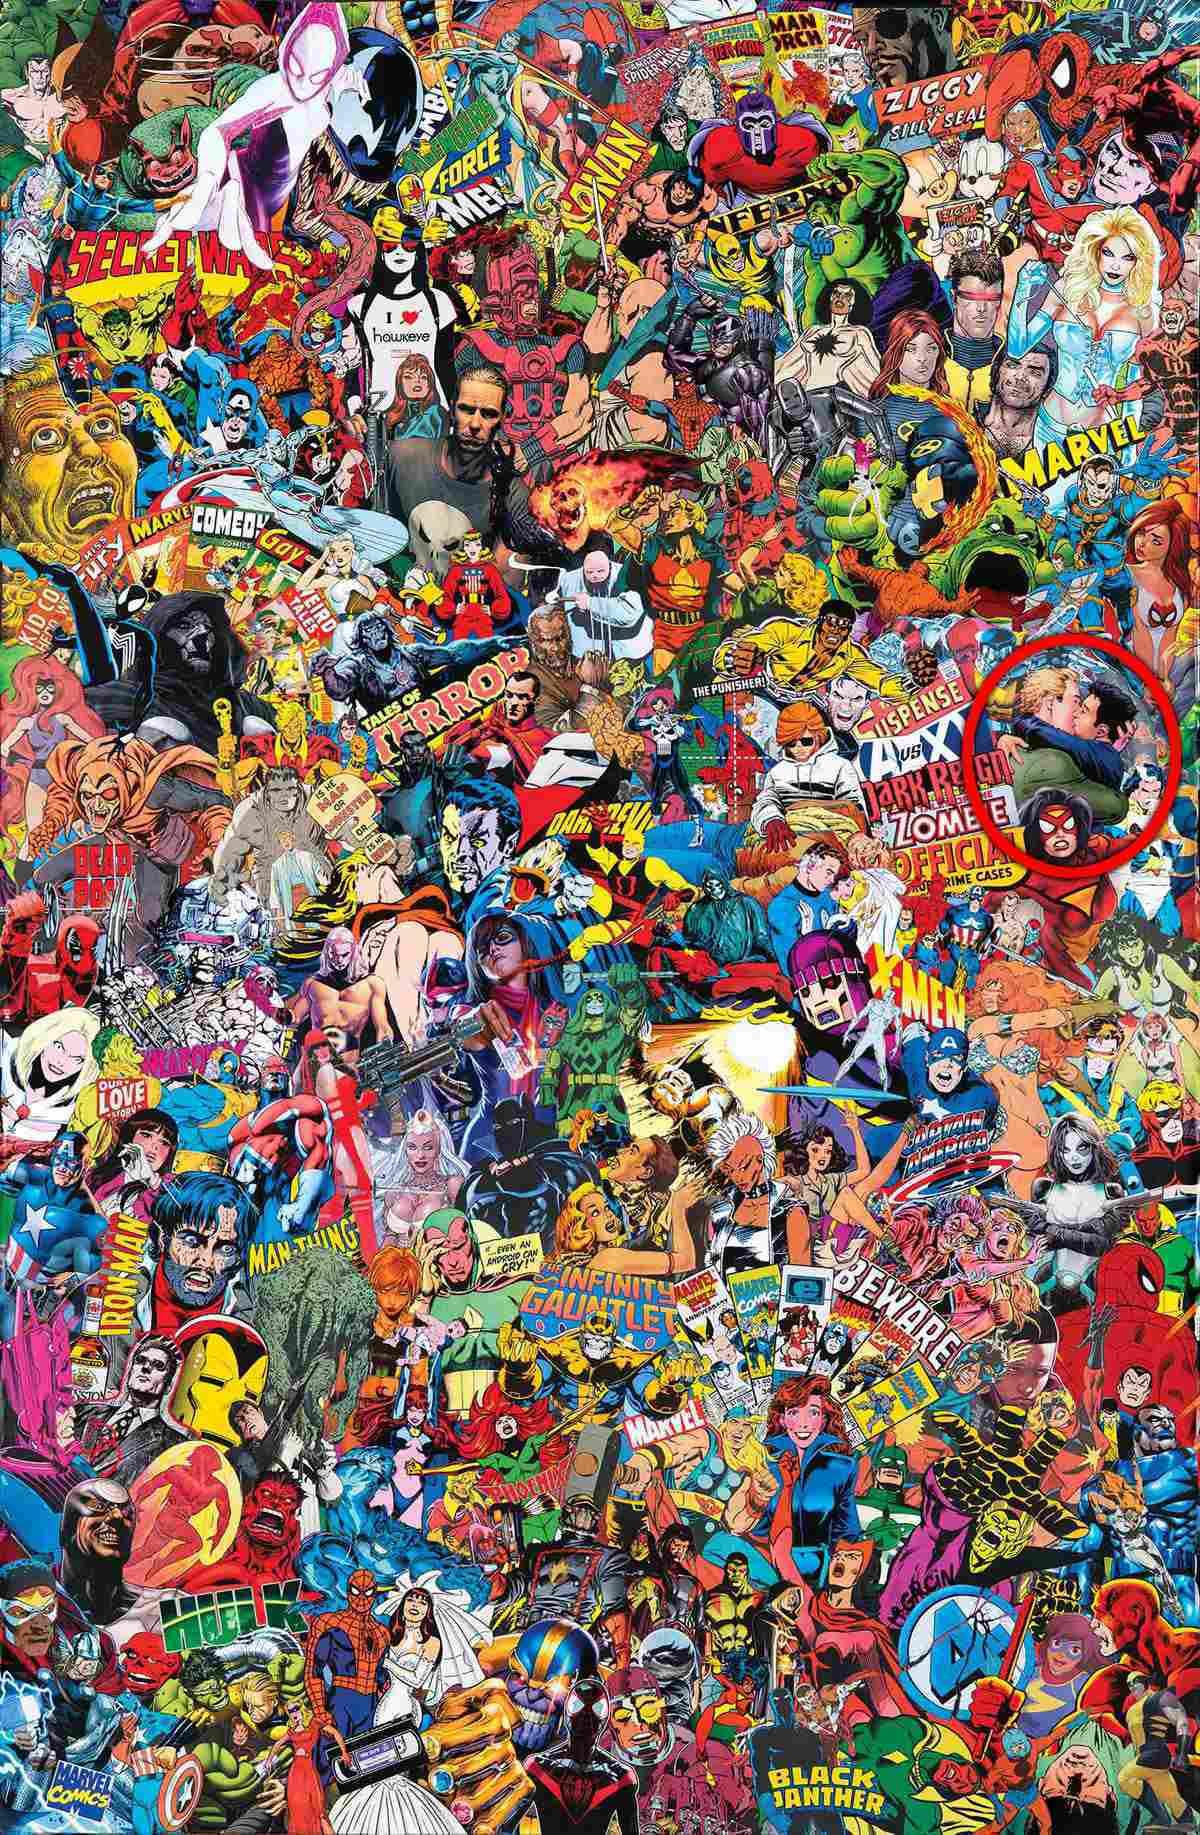 Marvel-Comics-1000-Collage-Variant